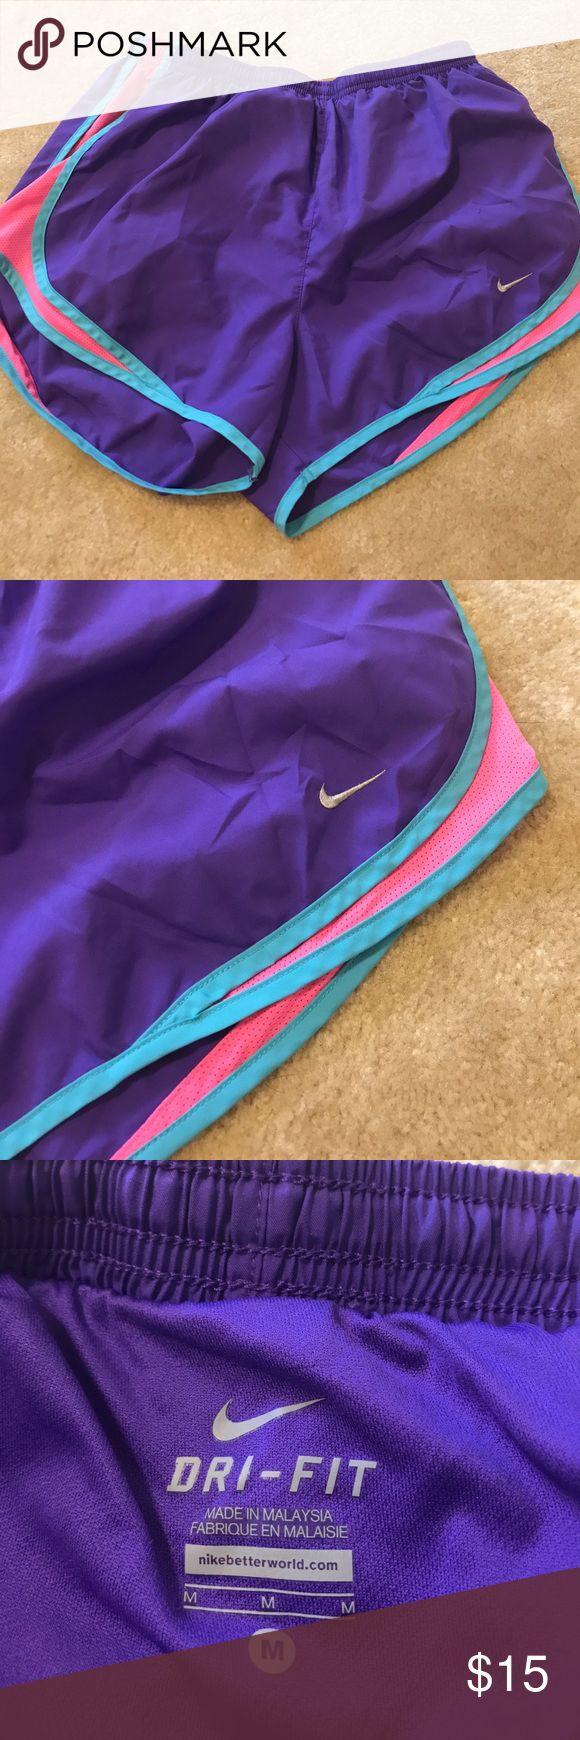 Women's Nike dri fit shorts sz M Women's Nike Dri-Fit shorts. Pink, purple and teal.  Has panty inside.  Size medium. Smoke free home. Like new Nike Shorts